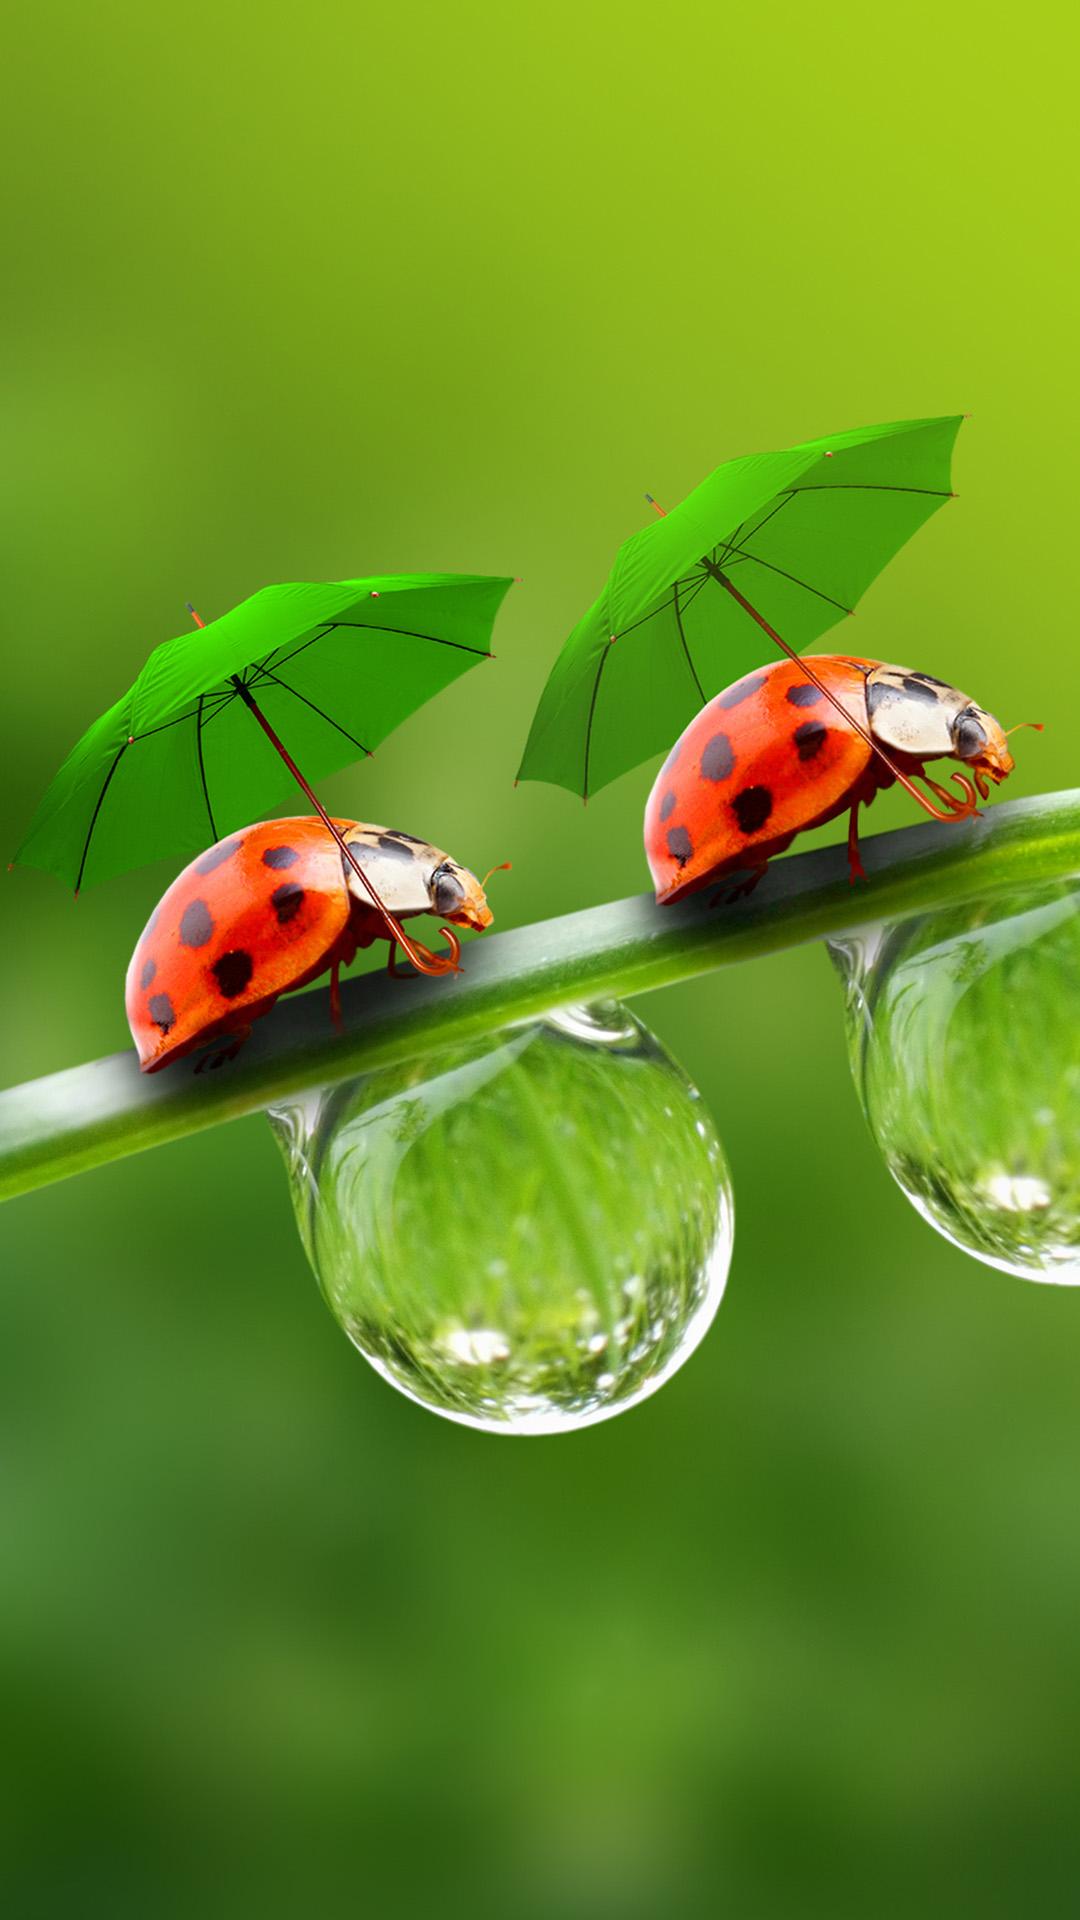 Umbrella Beetle